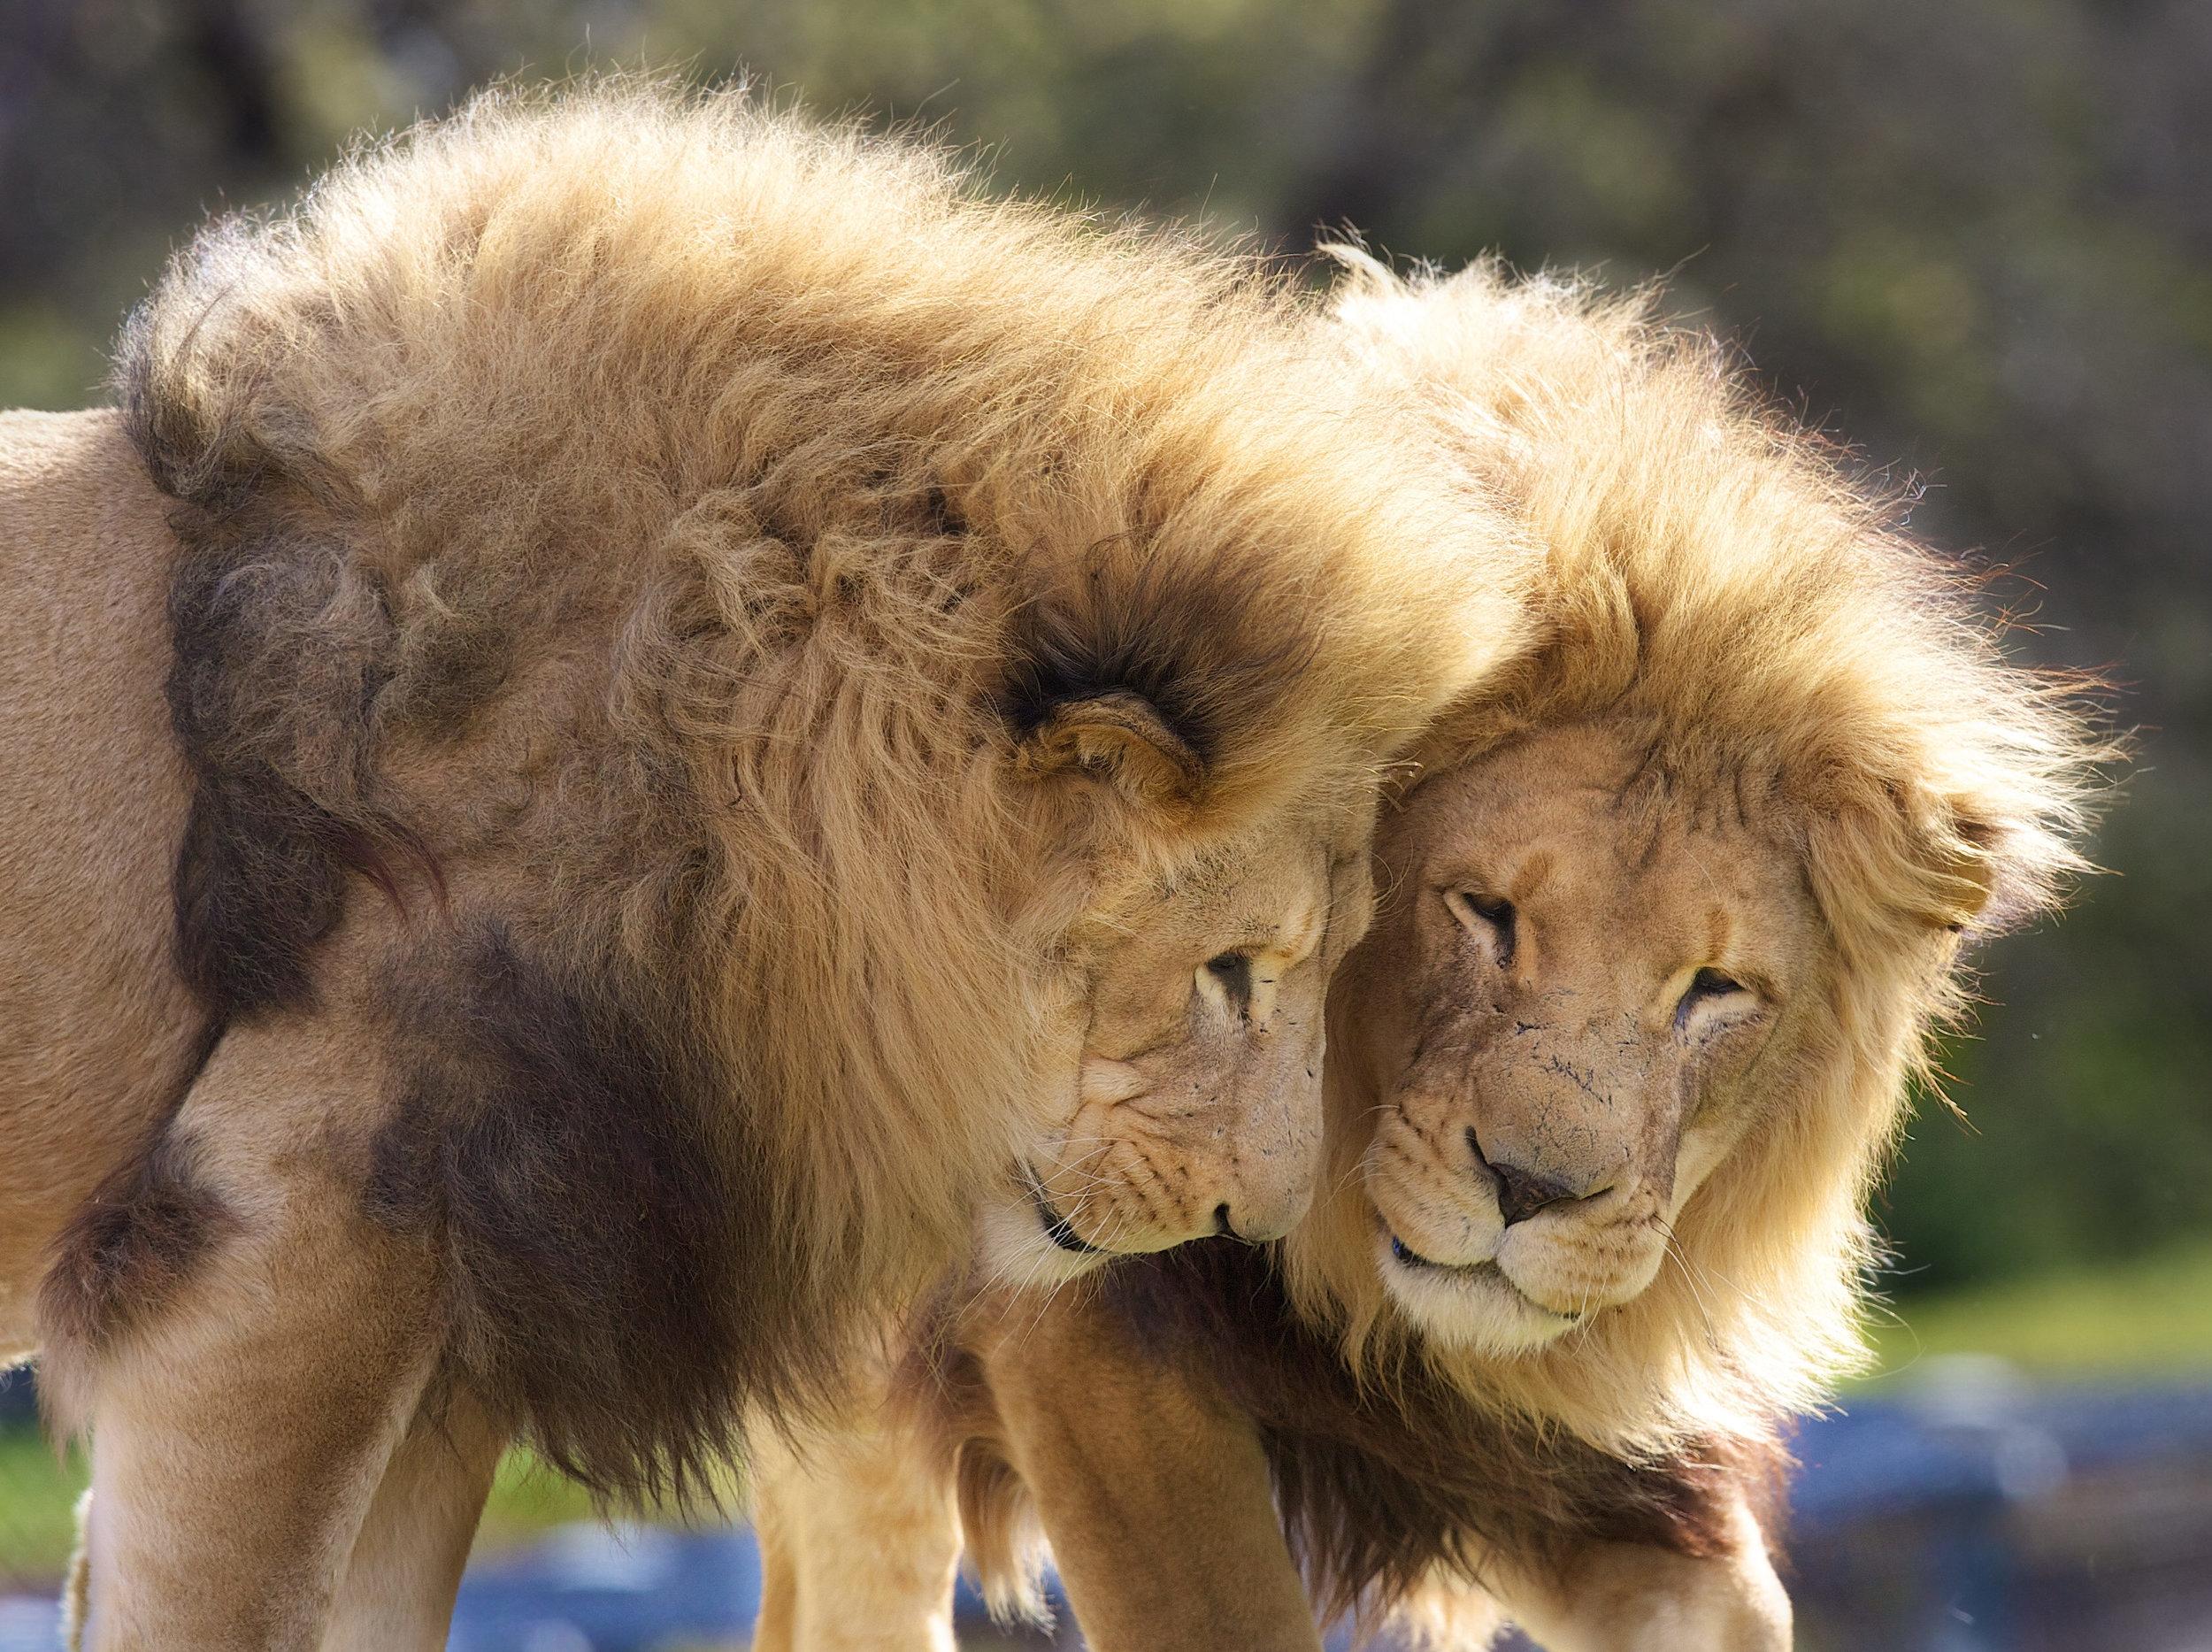 CHP_Export_10096545_Werribee Open Range Zoo Lions Tombo and Tonyl..jpg